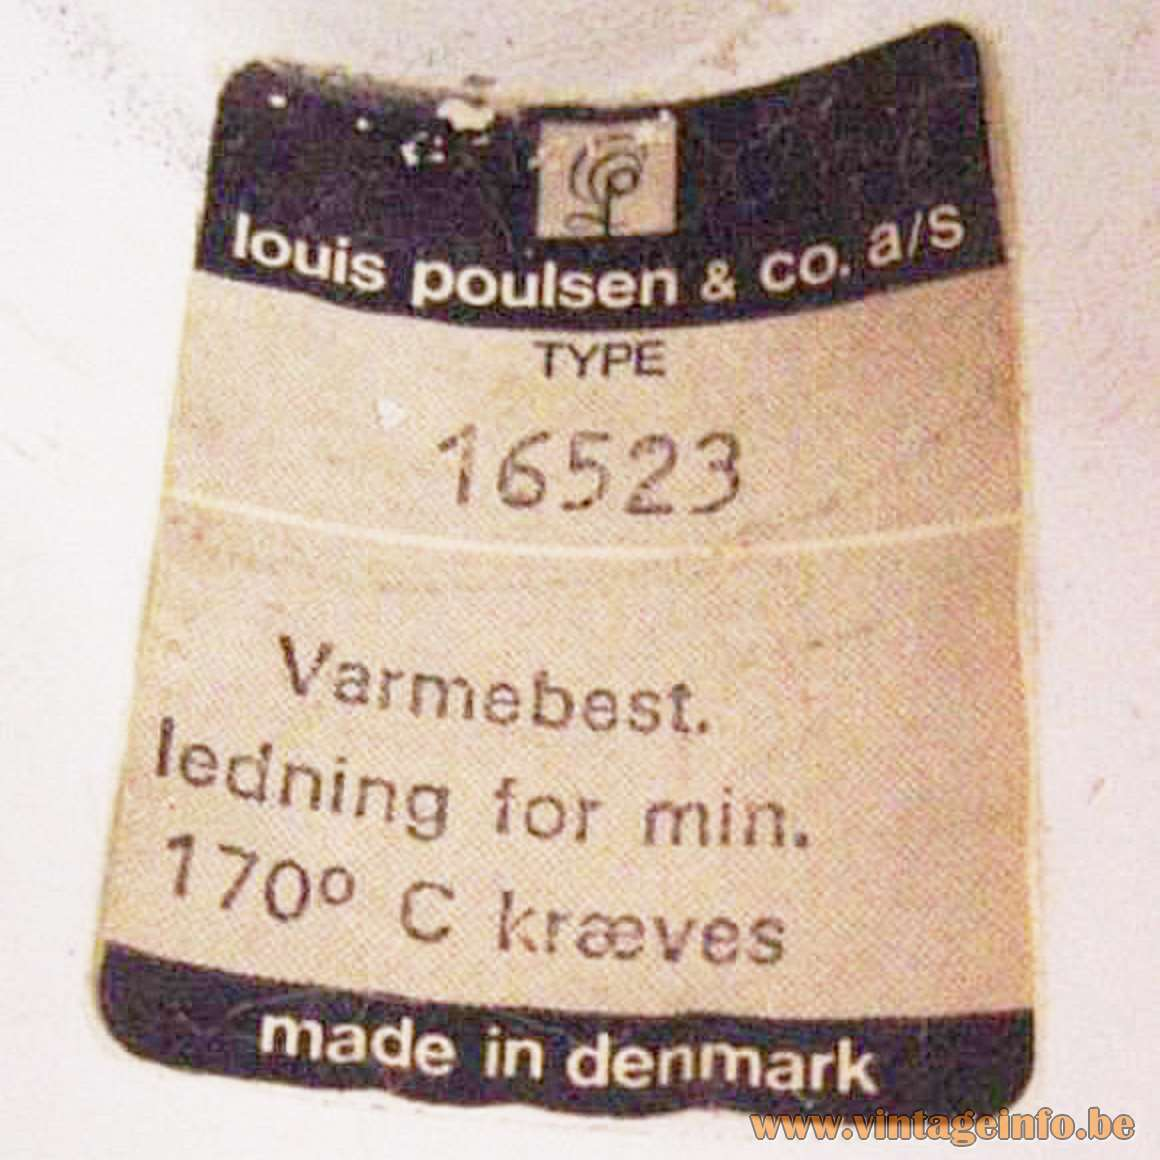 Poulsen Billiard Pendant Light - label 16523